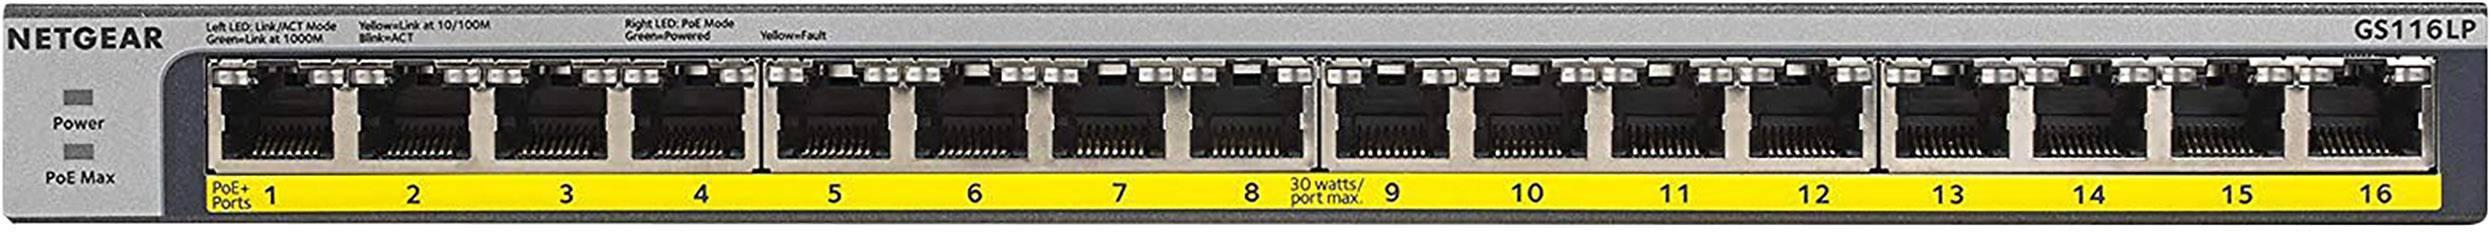 Netgear Prosafe Gs116lp Provu Communications